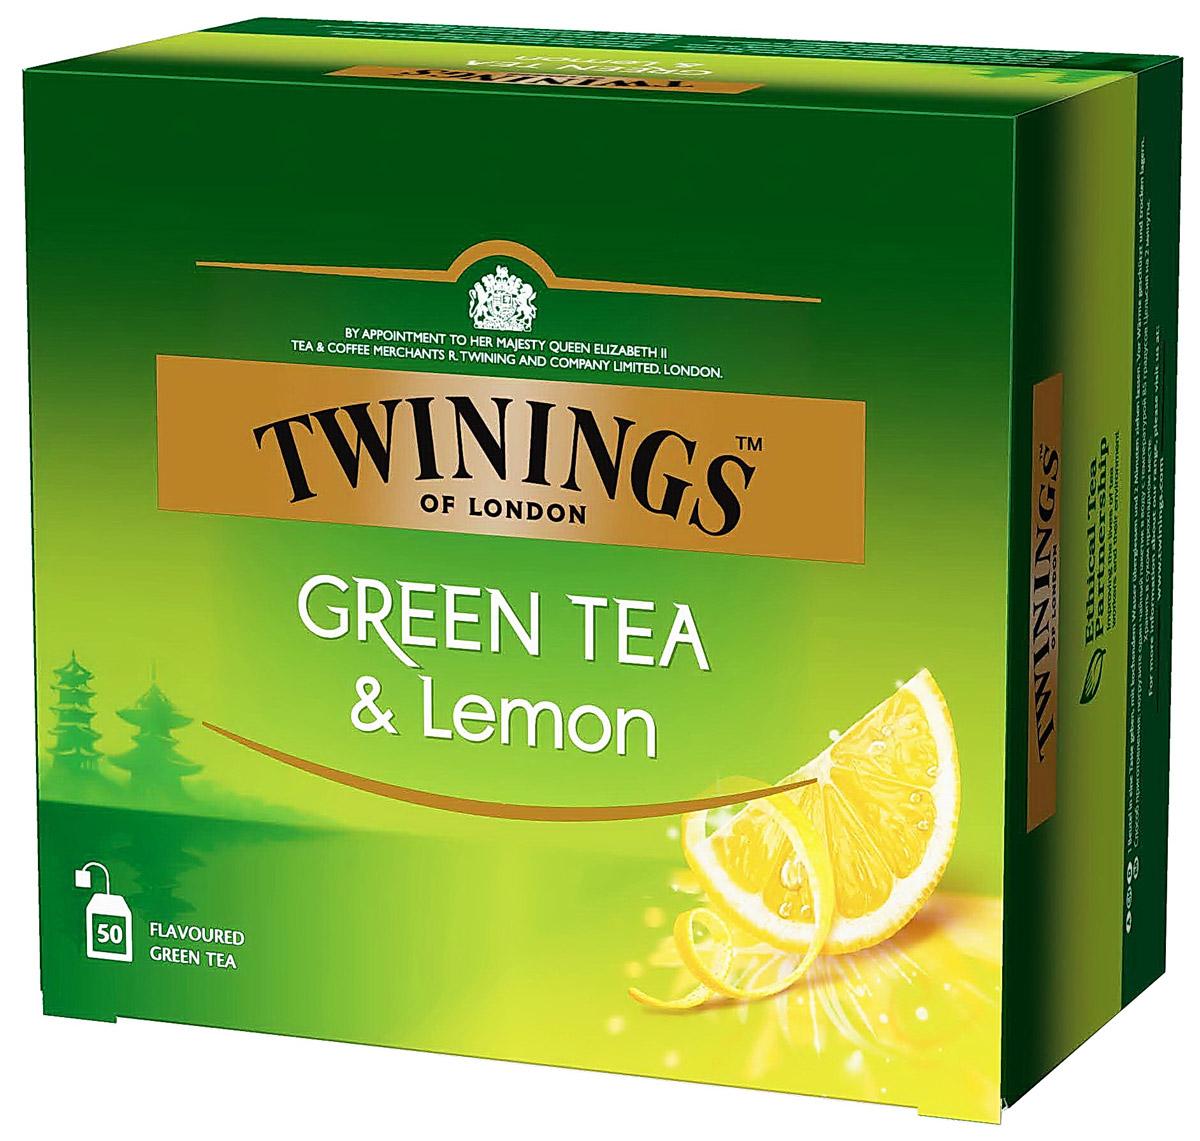 цена на Twinings Green Tea & Lemon зеленый чай с цедрой лимона в пакетиках, 50 шт